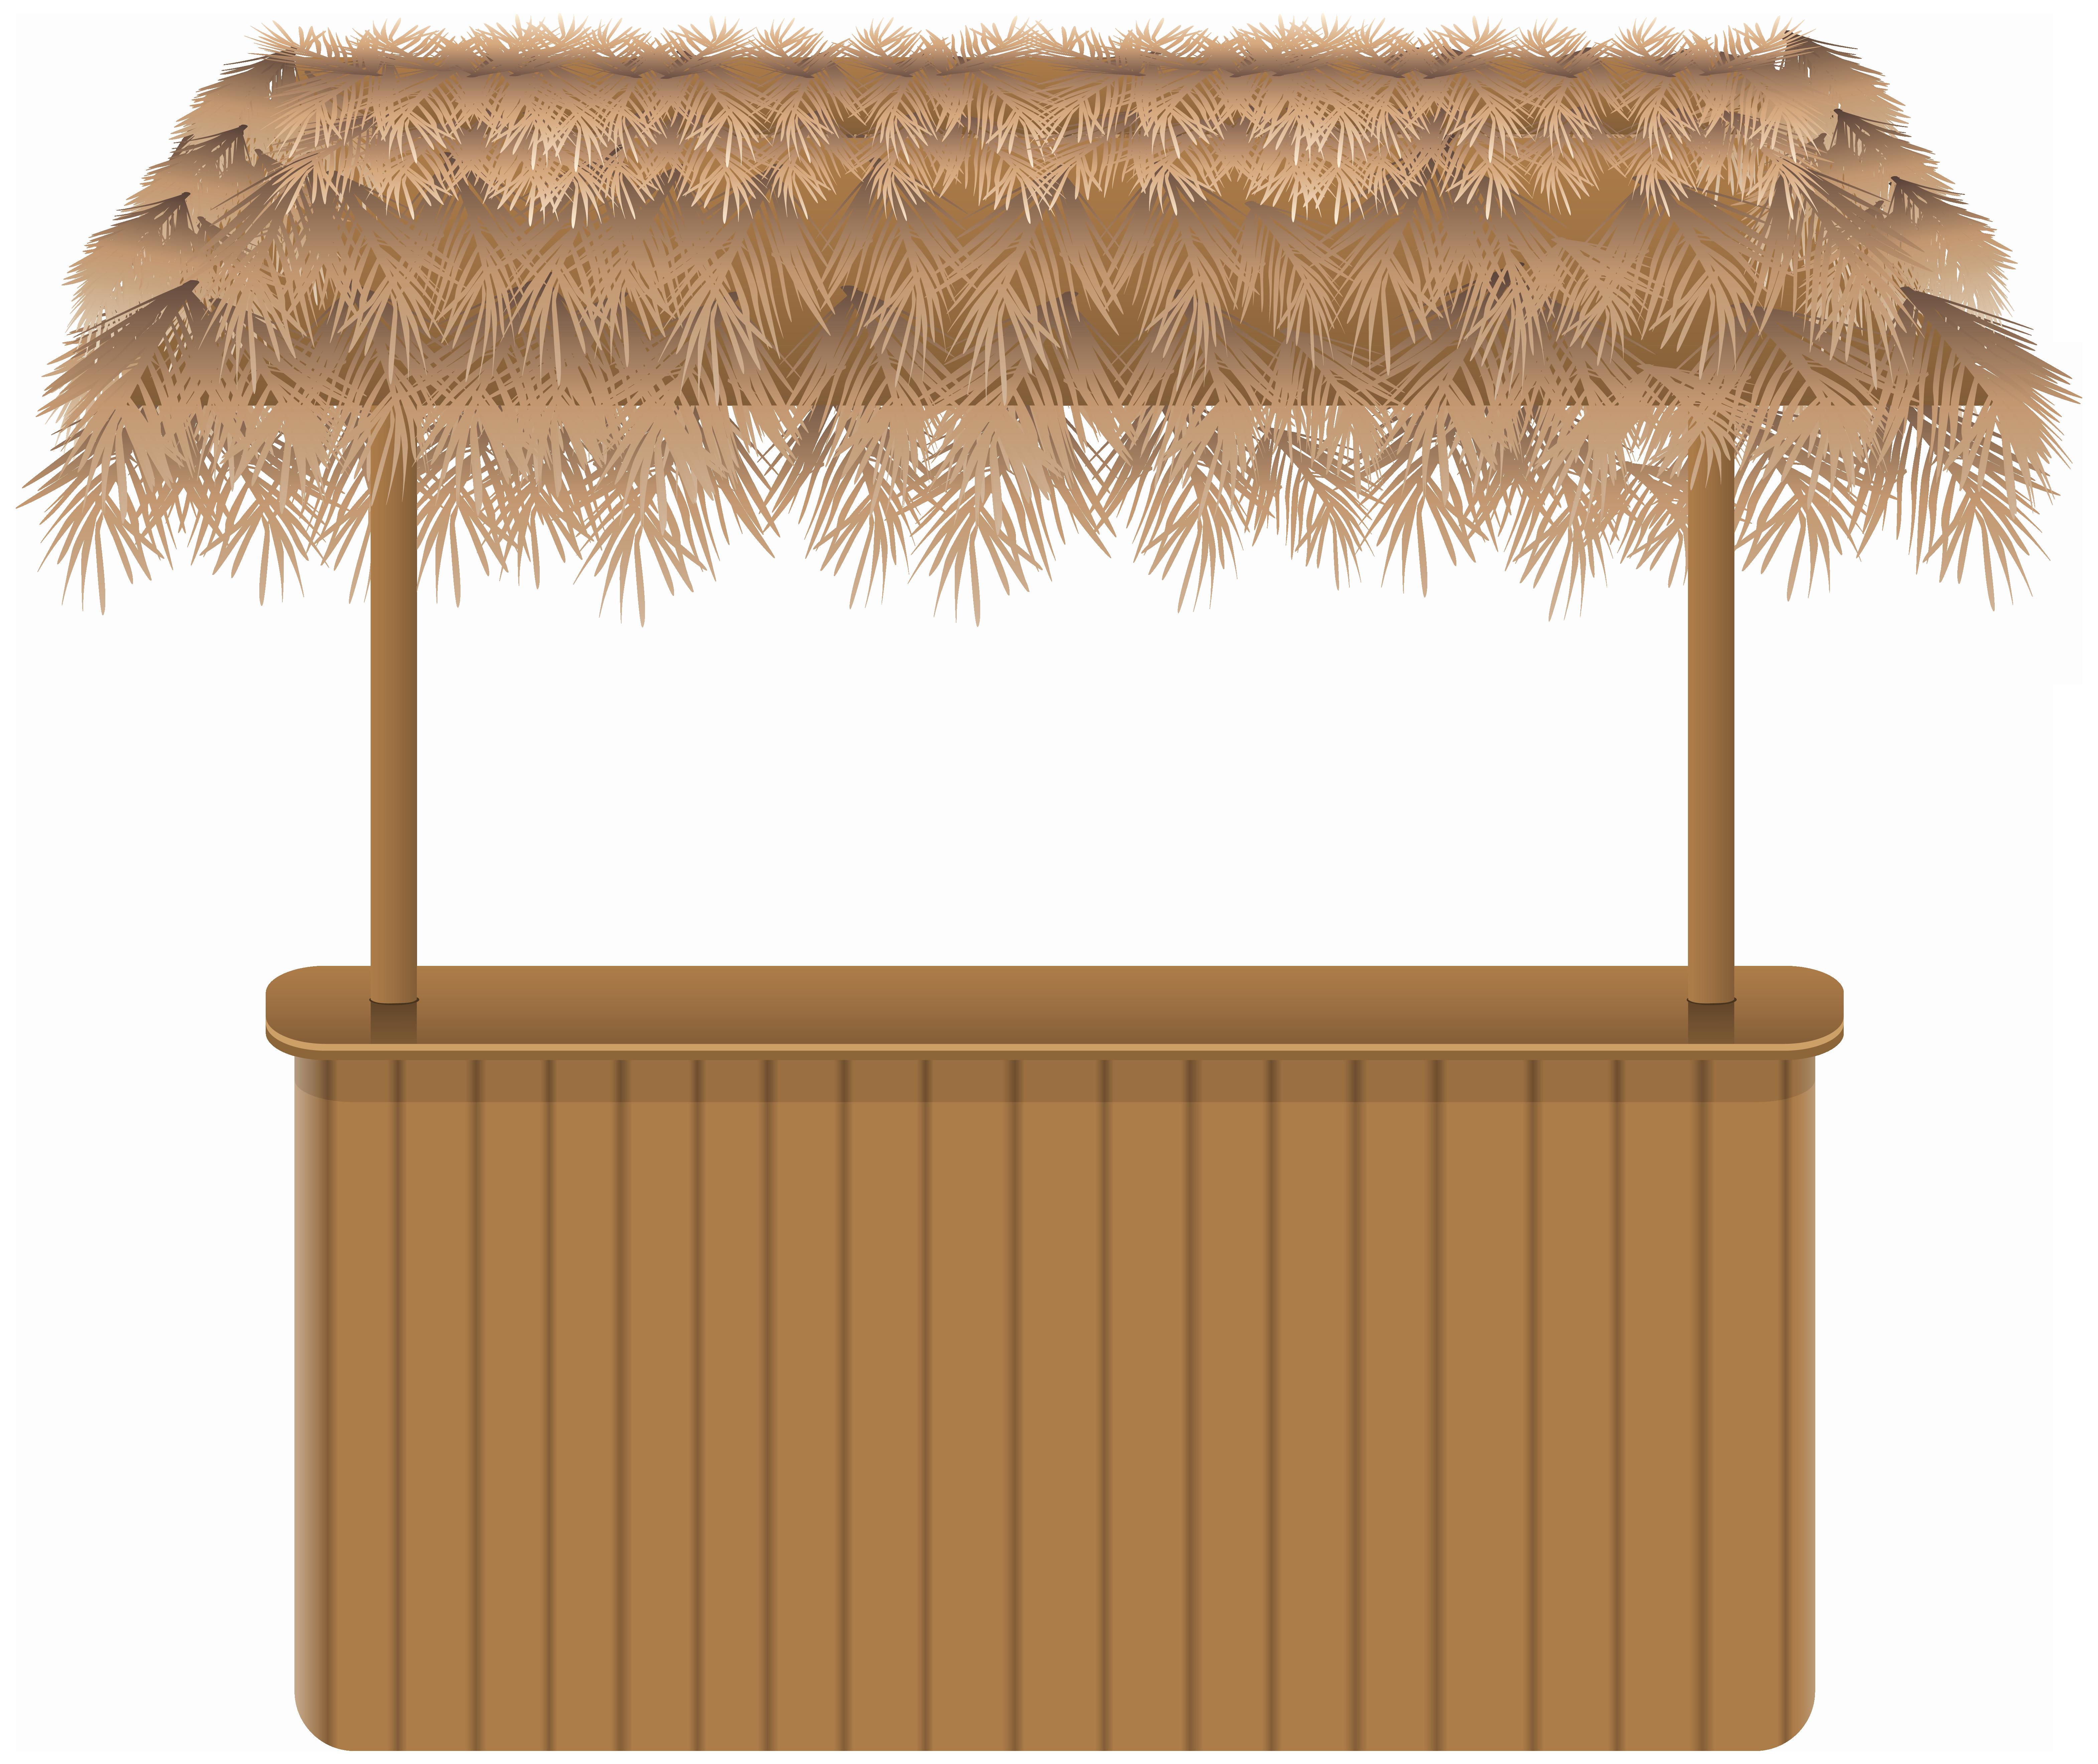 Hawaiian clipart tiki bar. Beach png clipar image